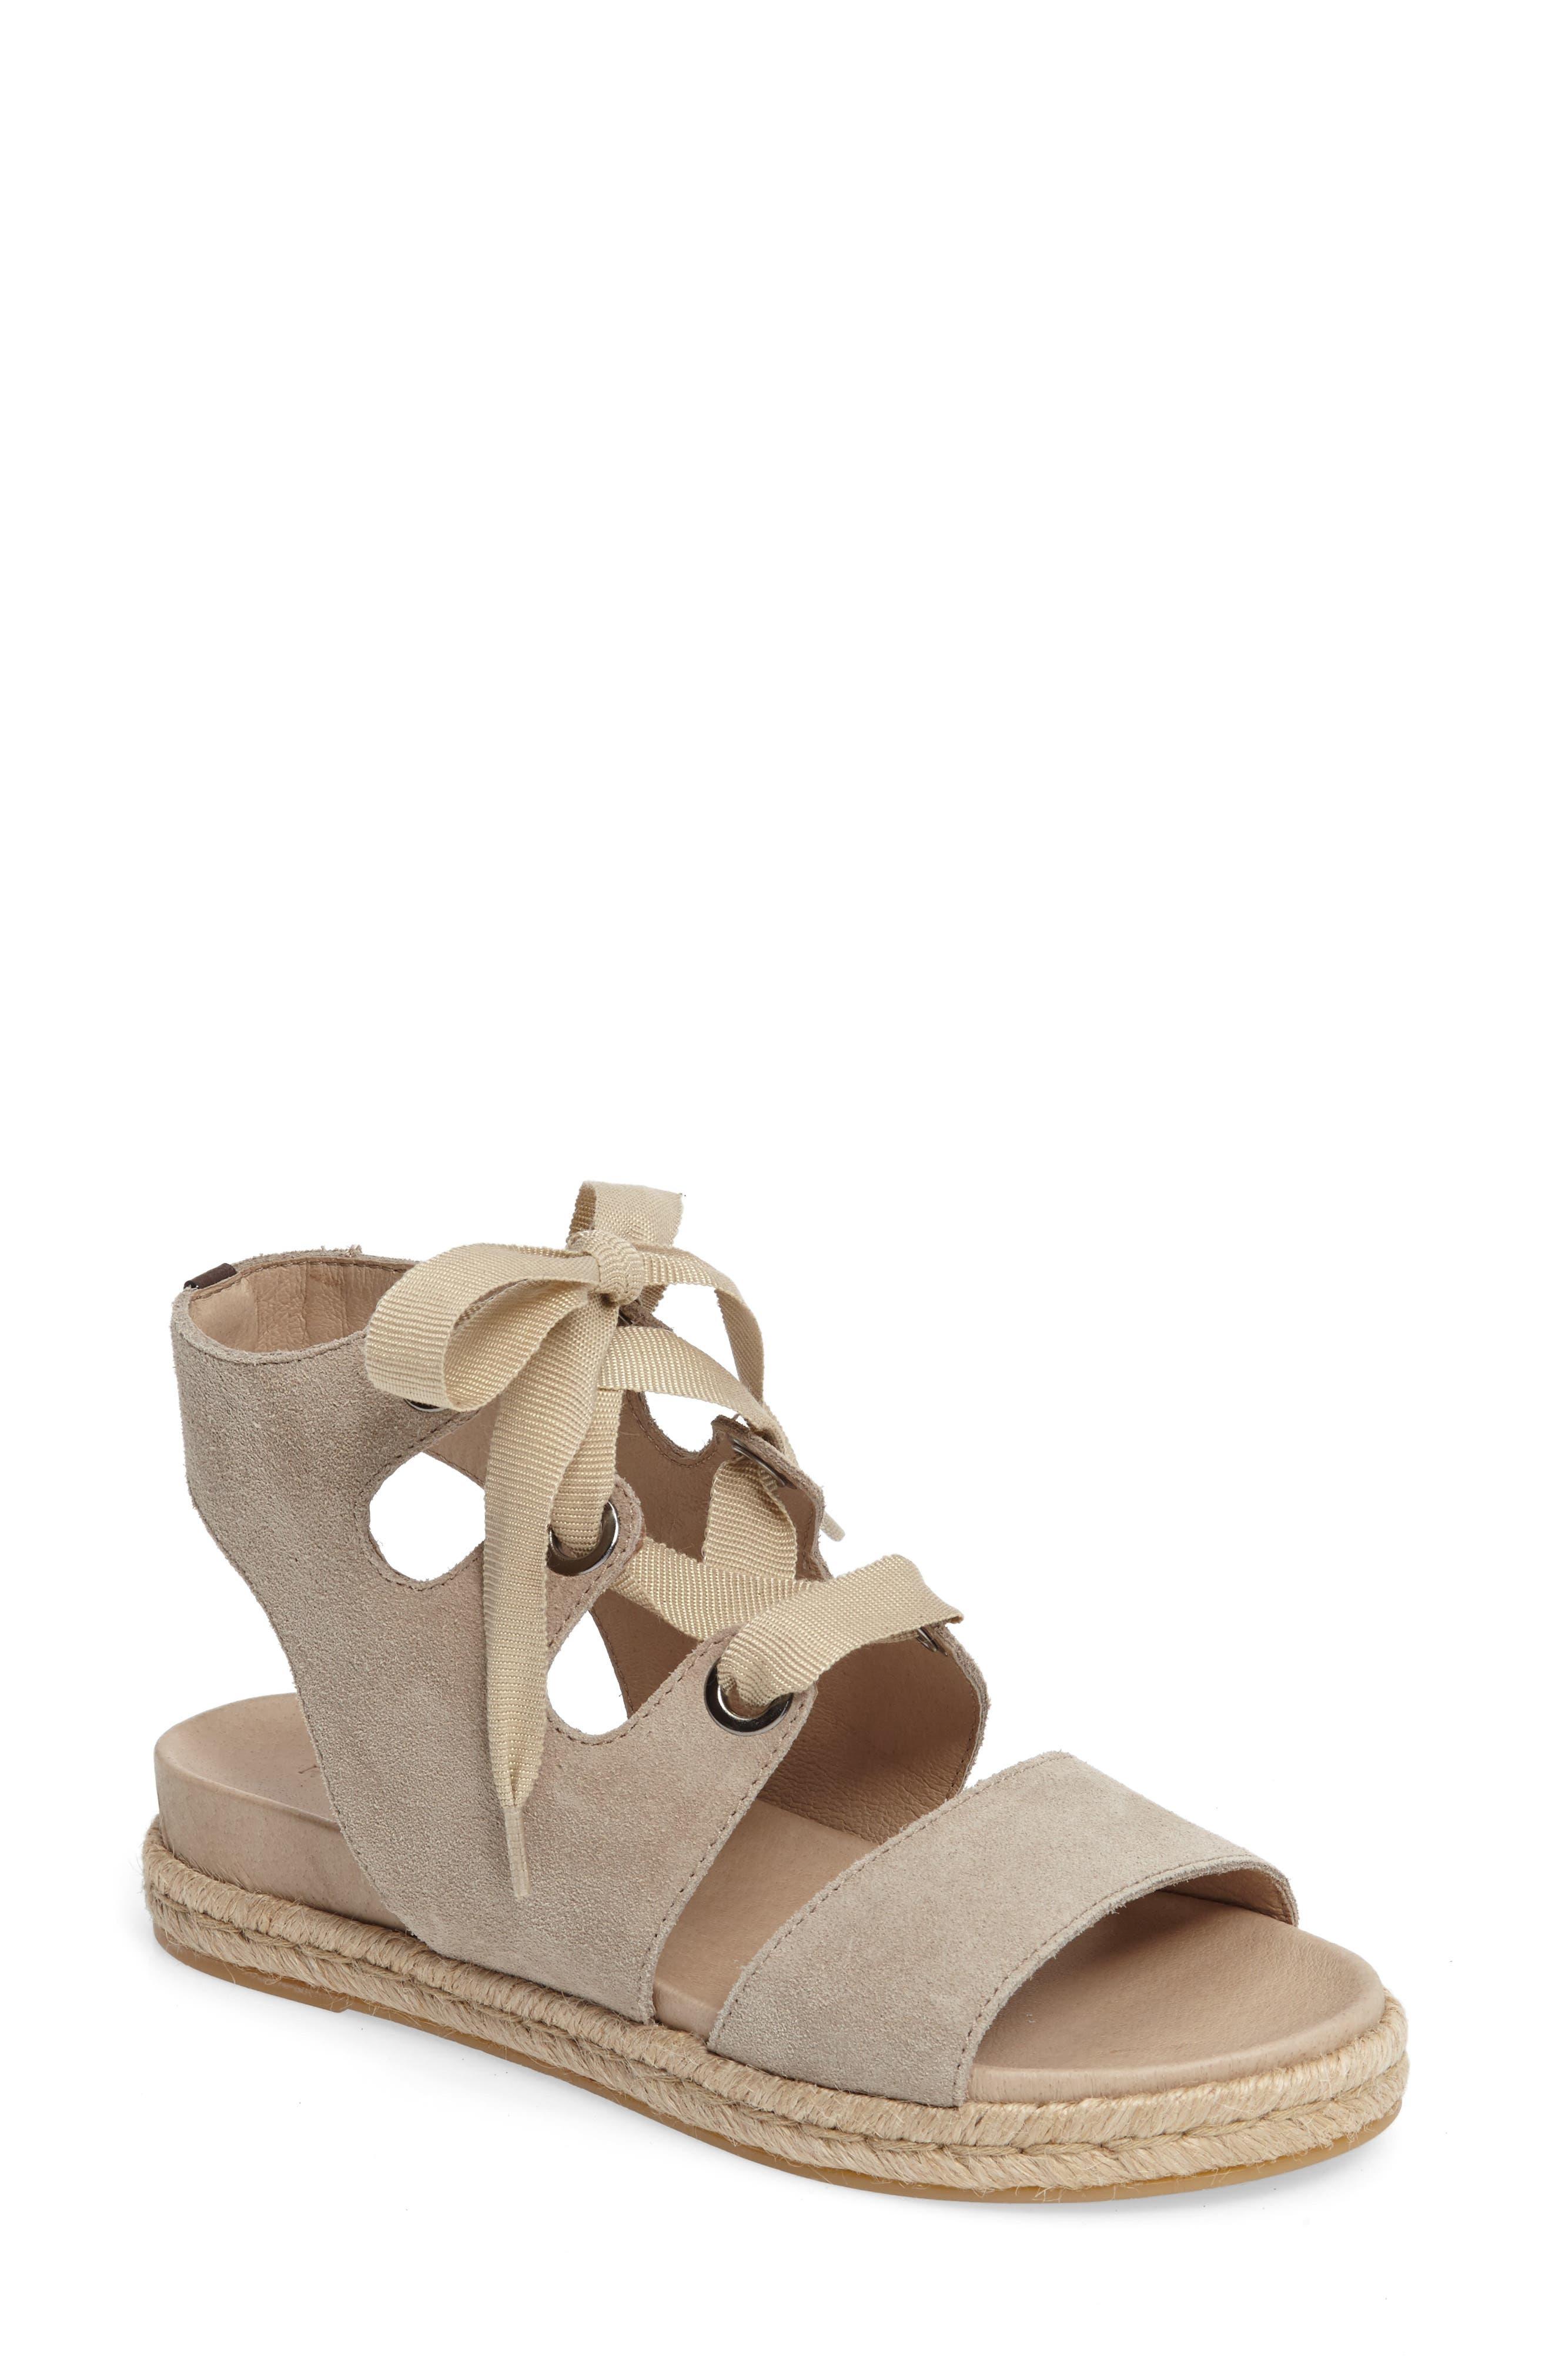 Main Image - Rudsak Baptista Lace-Up Sandal (Women)